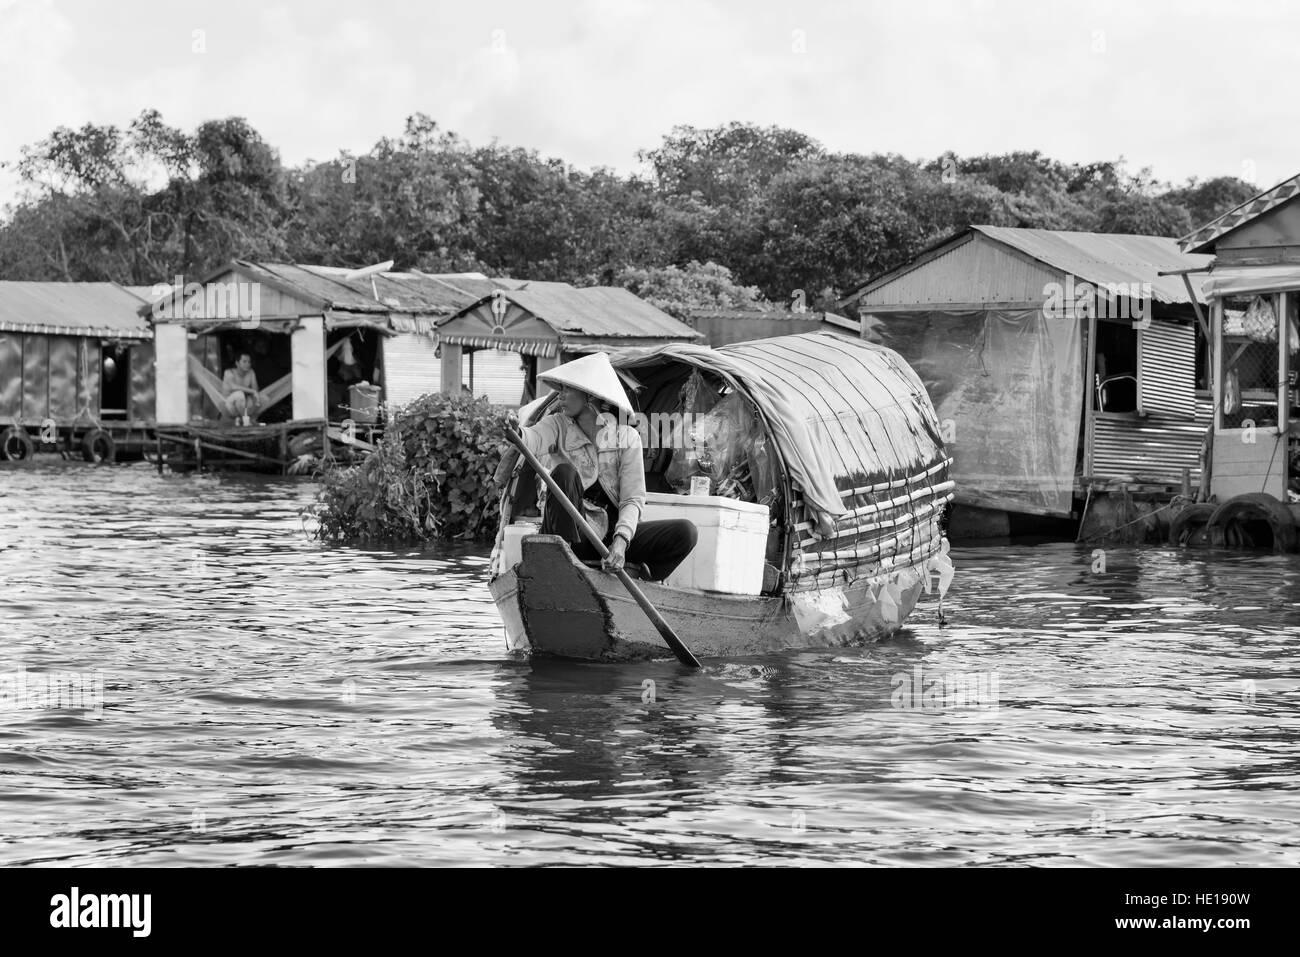 Tonle Sap floating village - Stock Image